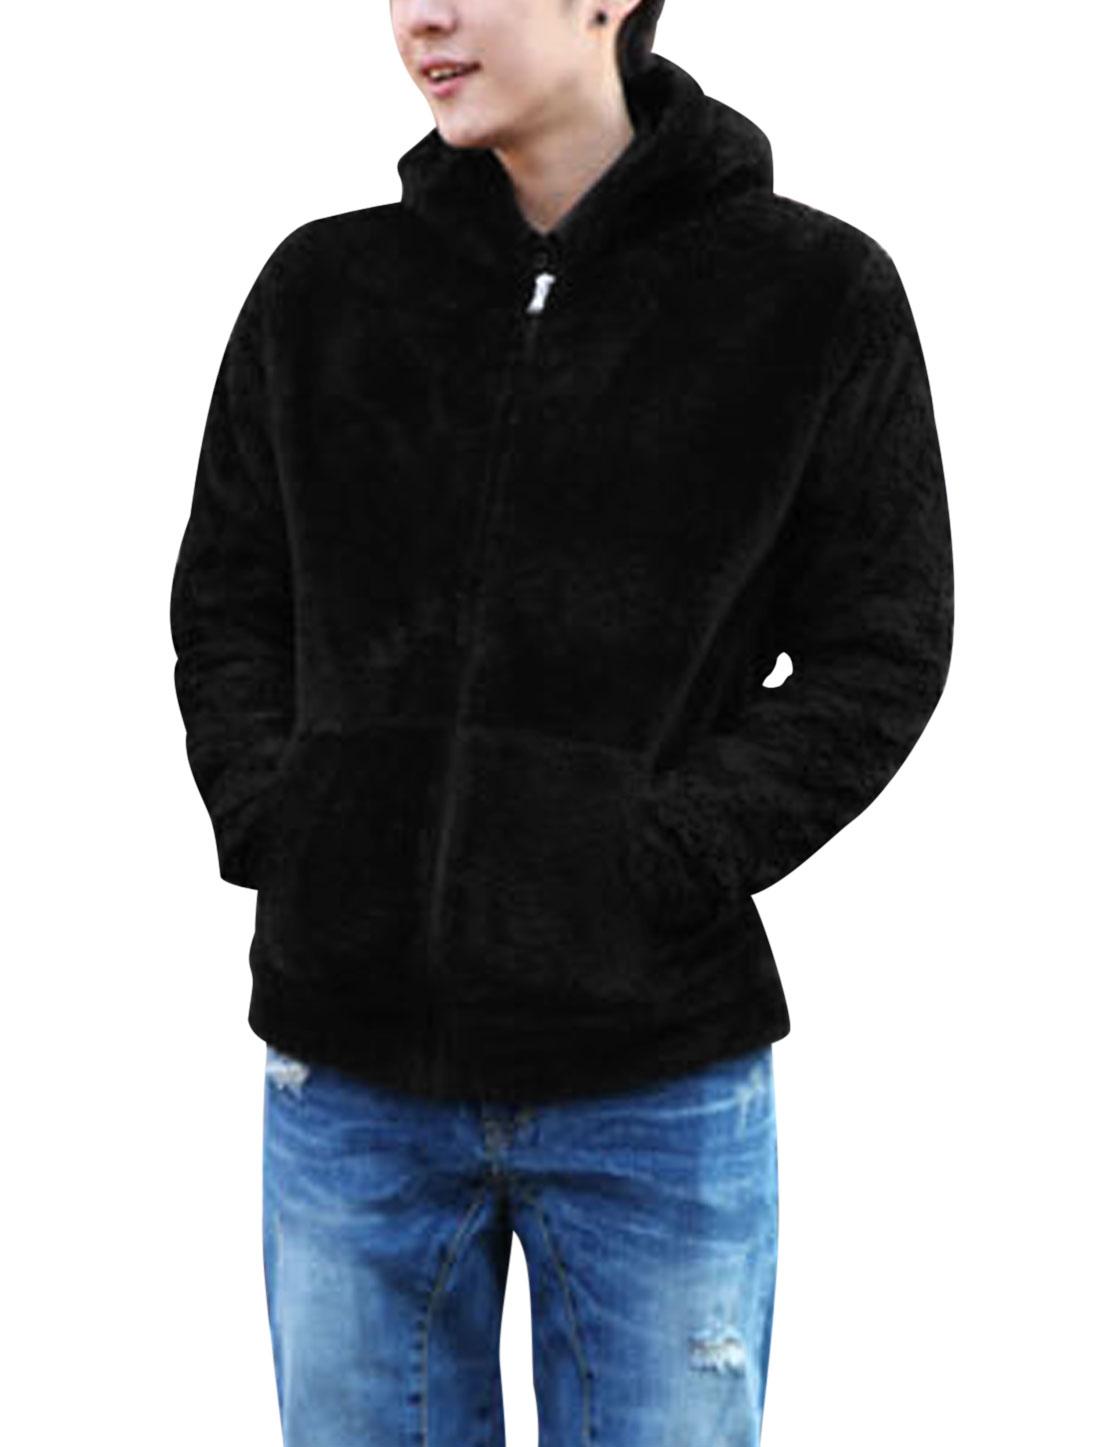 Men Long Sleeve Zip Closure Leisure Fleece Jacket Black S